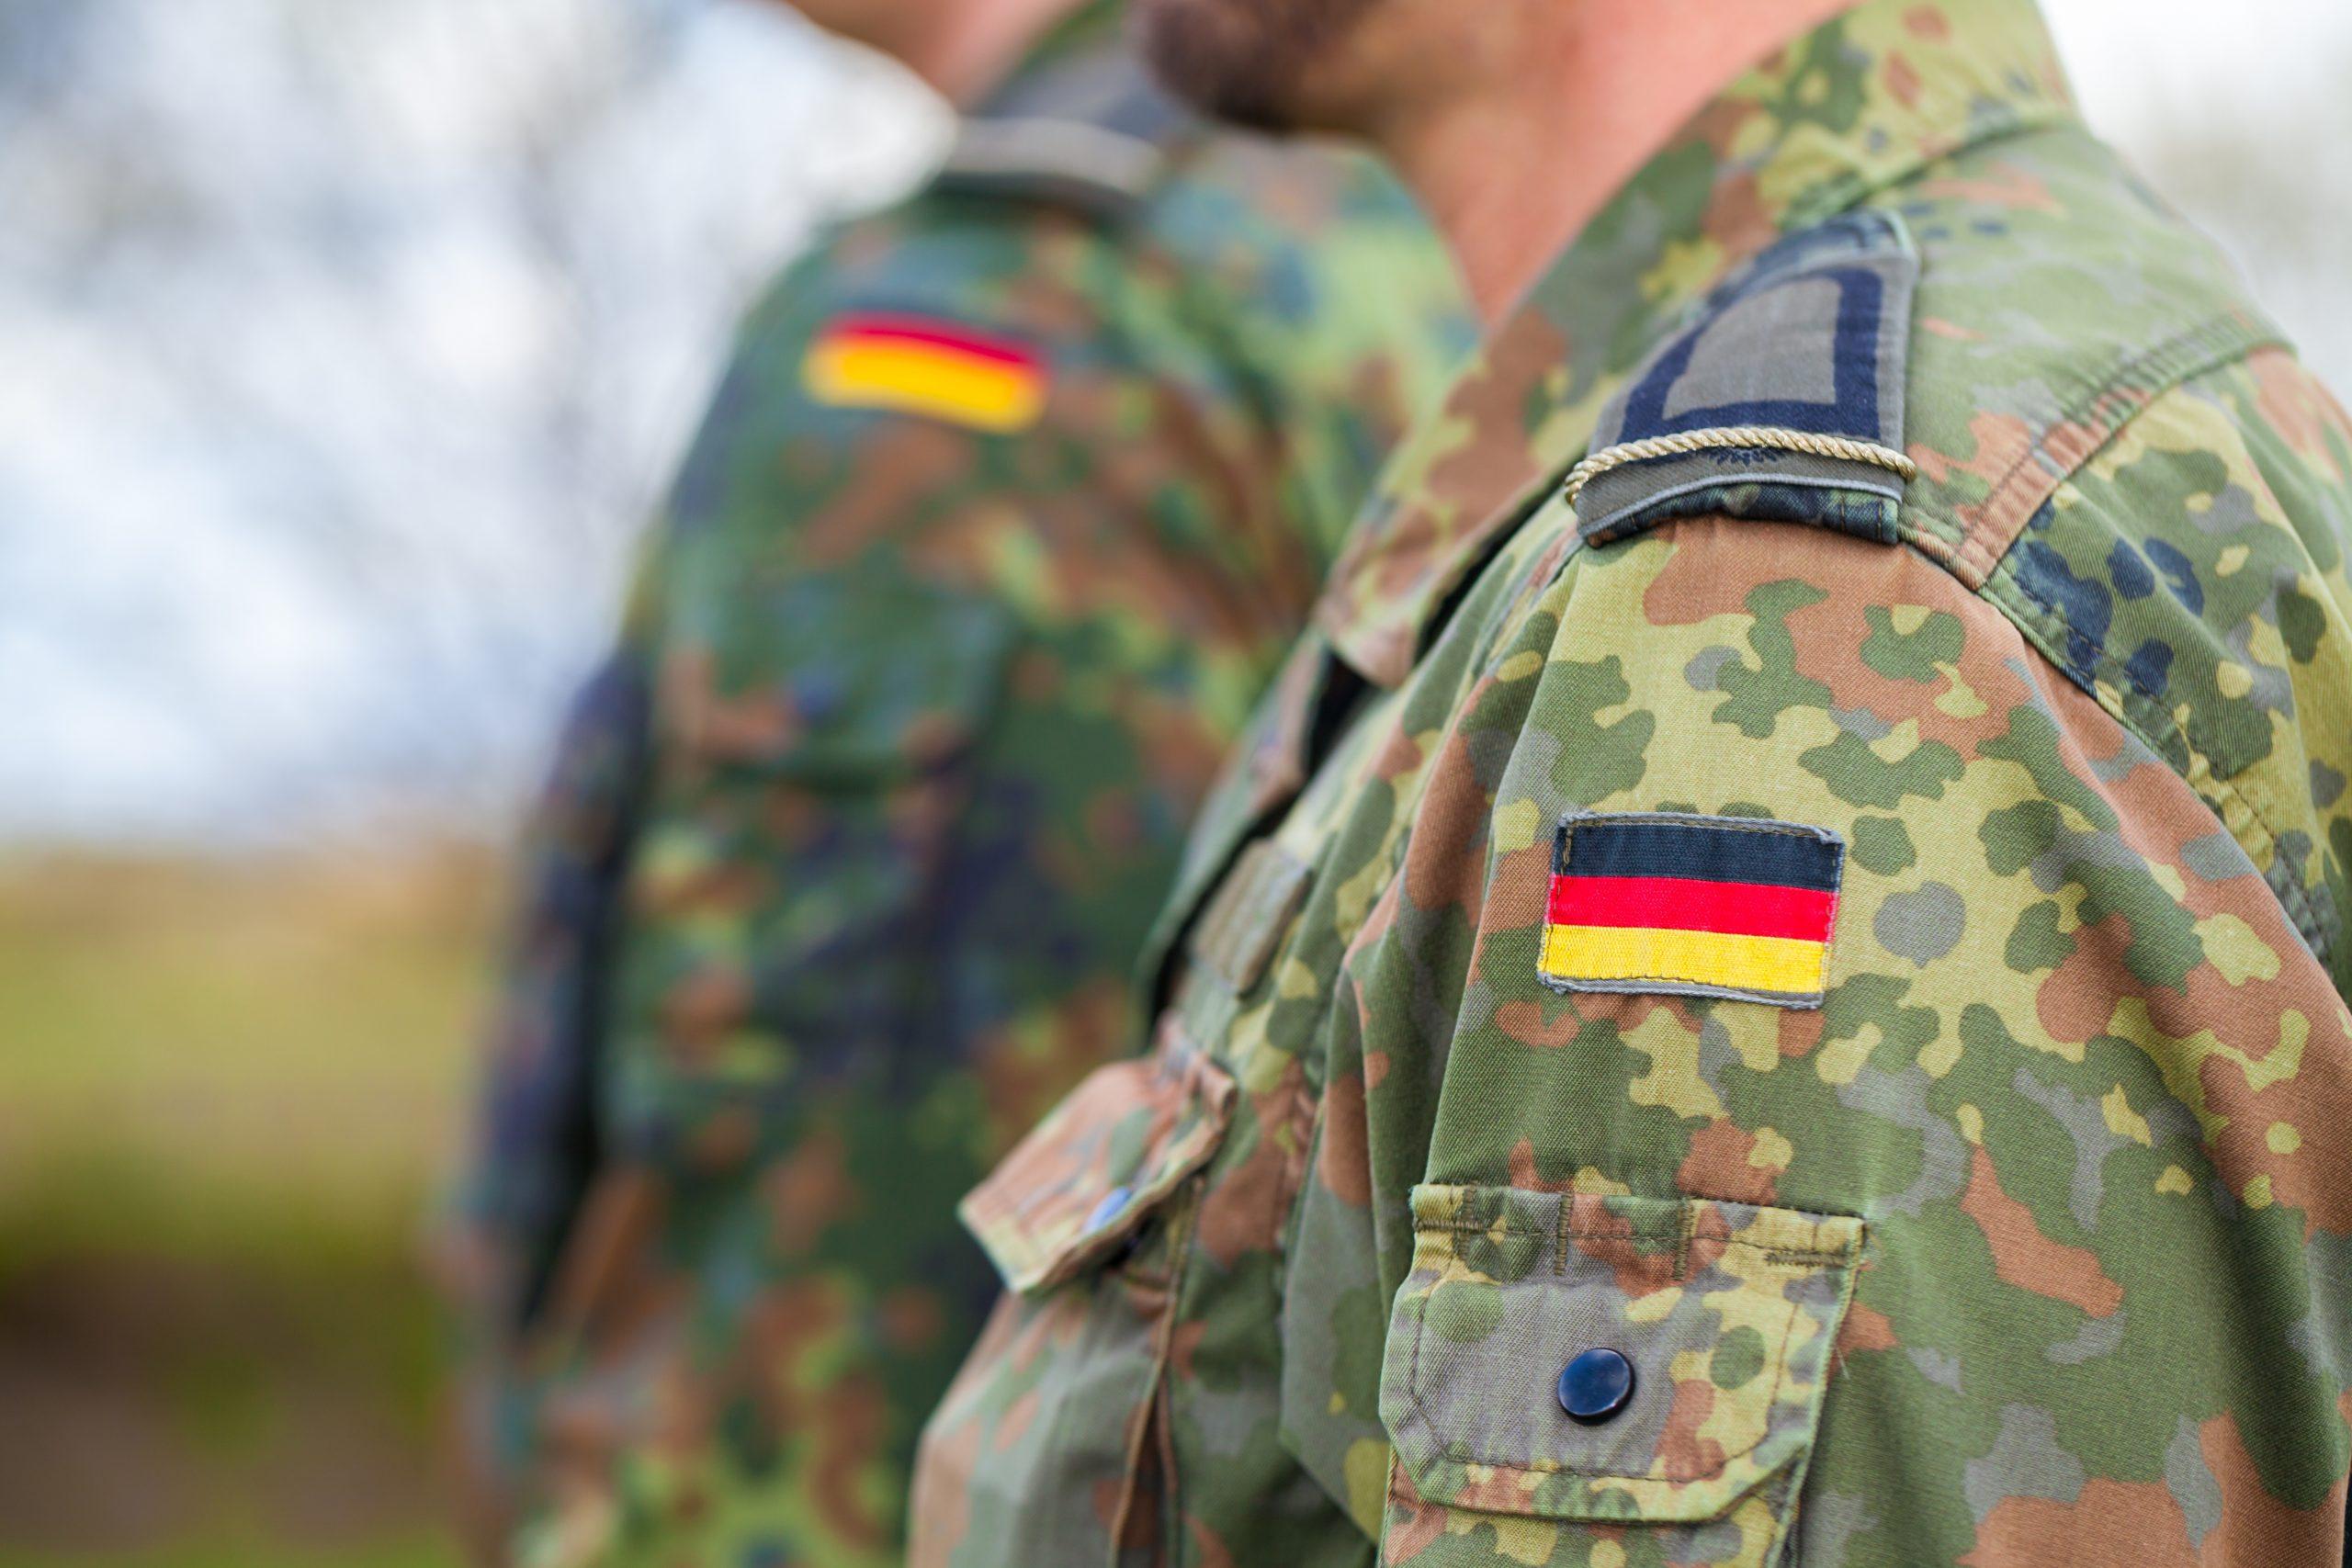 Neo-Nazi ـ German soldier in alleged far-right plot